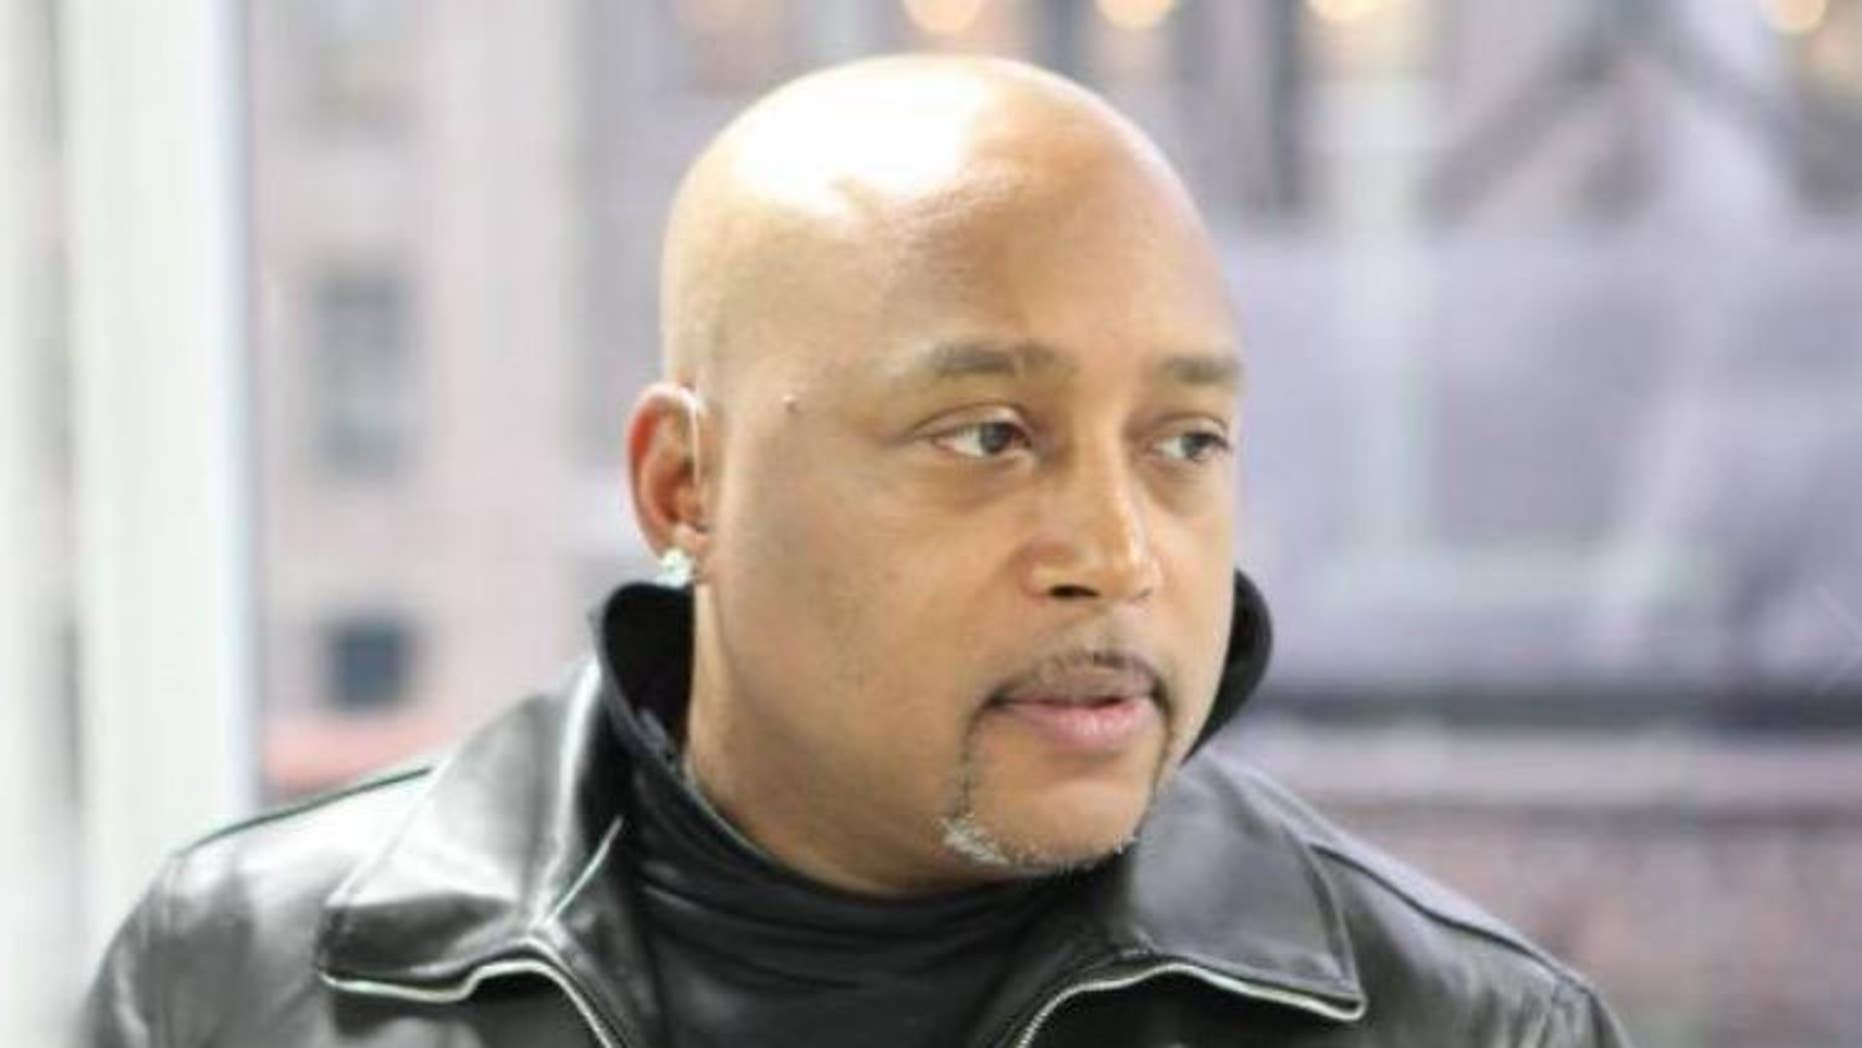 Daymond John told TMZ that 'Surviving R. Kelly' struck a nerve with him.